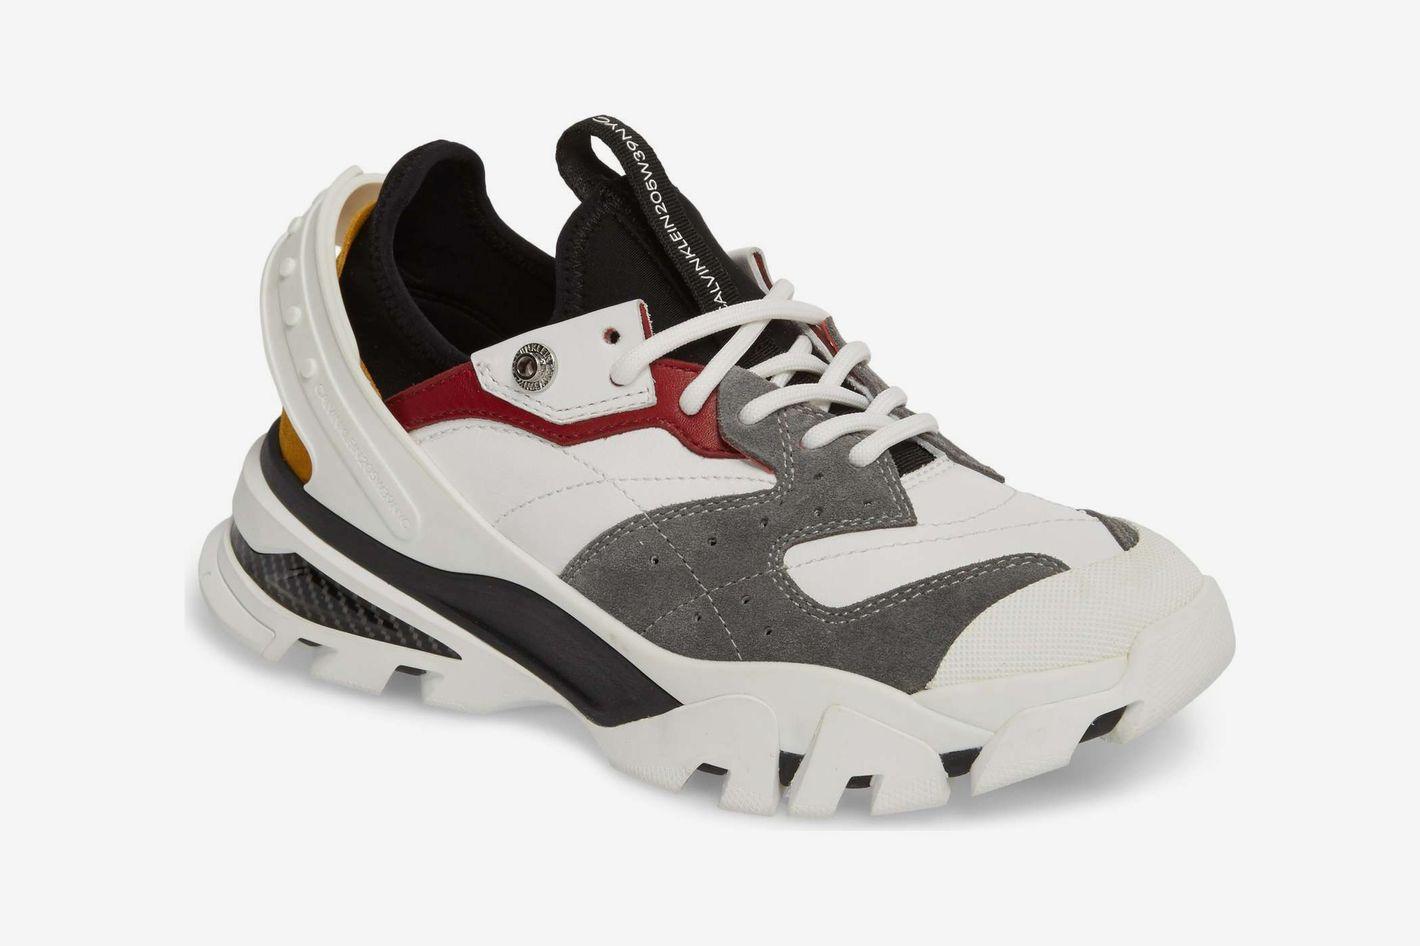 717a04eaf213 CALVIN KLEIN 205W39NYC Carla Sneakers